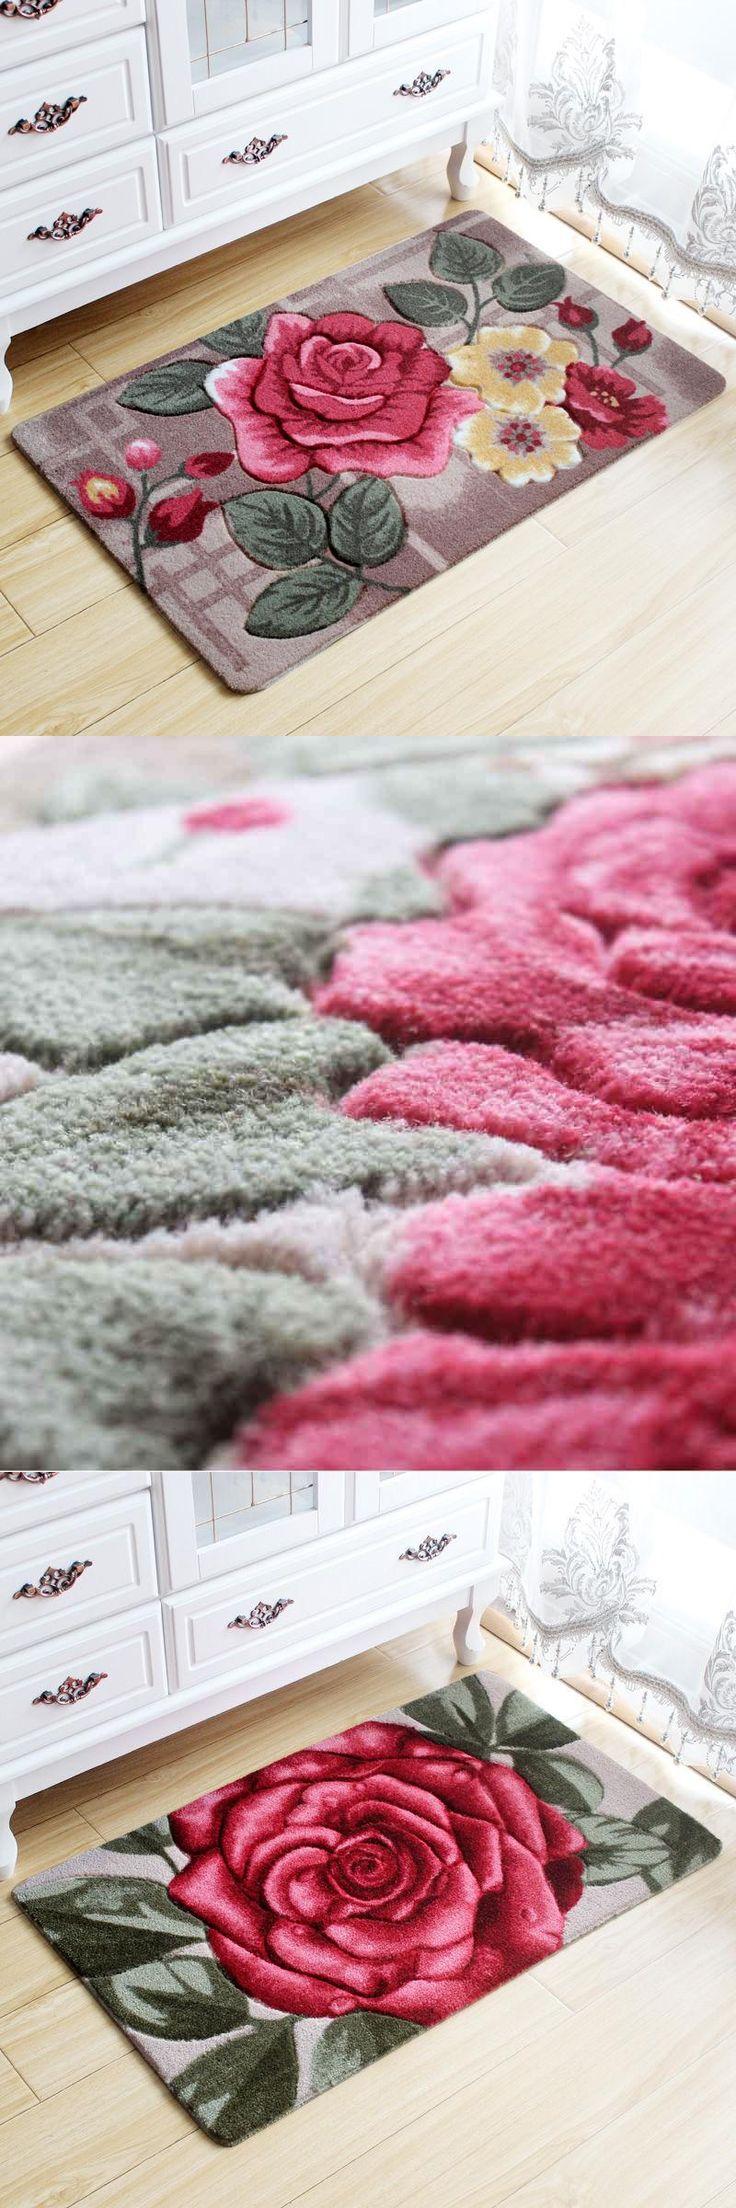 [Visit to Buy] Big 3D Flower Carpet Kids Room,Kitchen Rugs Bathroom Carpet,Doormat,Tapete Para Quarto,Entrance Door Mats Outdoor,Cheap Bath Mat #Advertisement